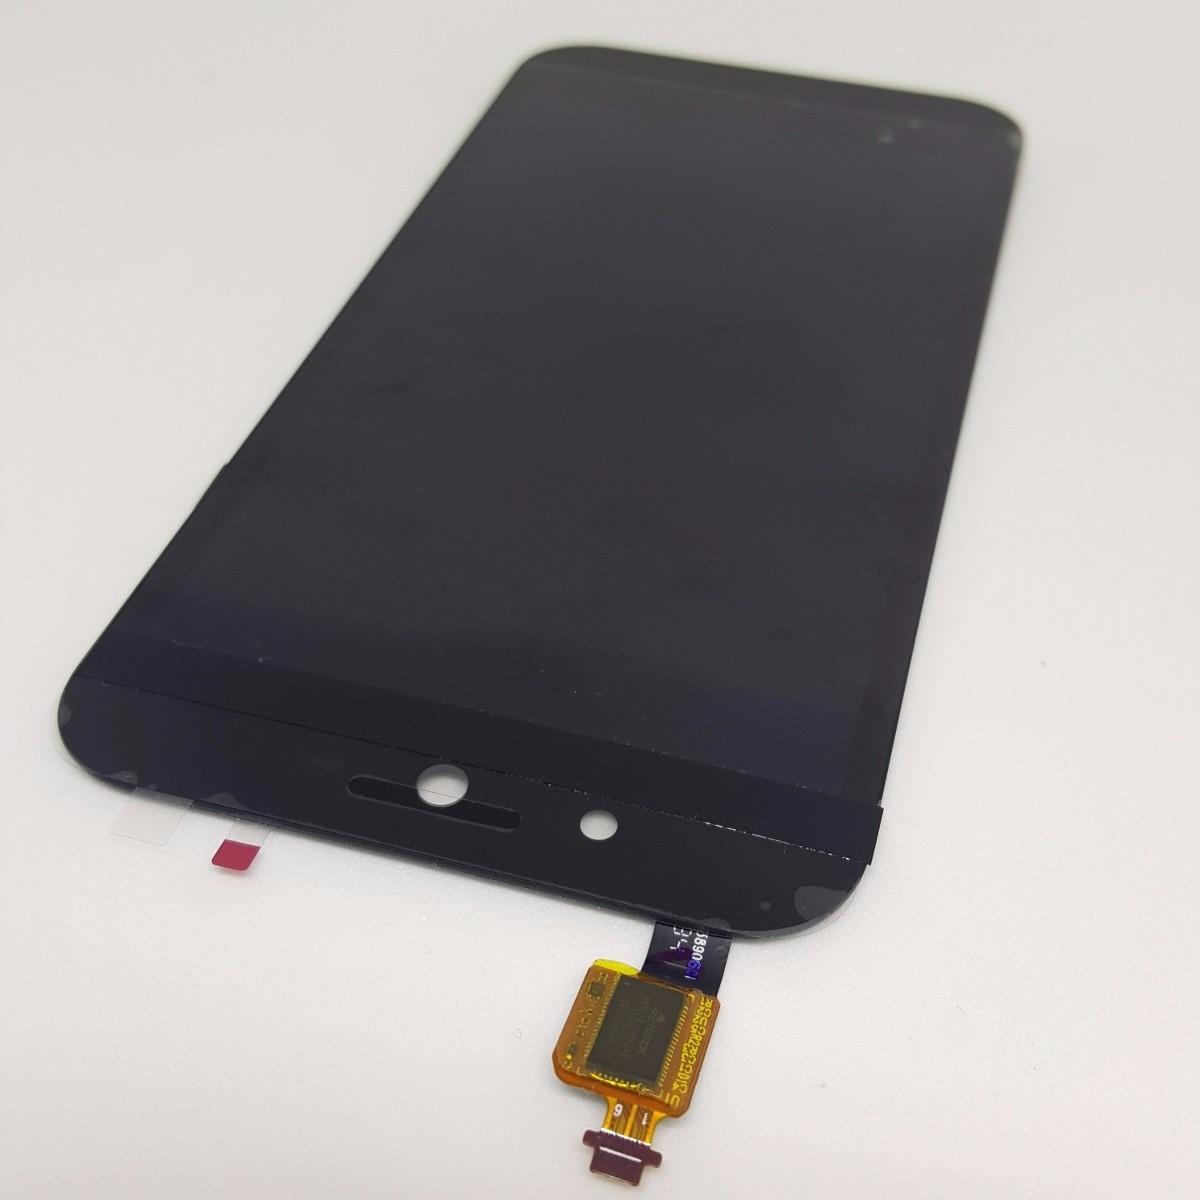 4b919fda3 display lcd tela touch asus zenfone live tv g500tg. Carregando zoom.